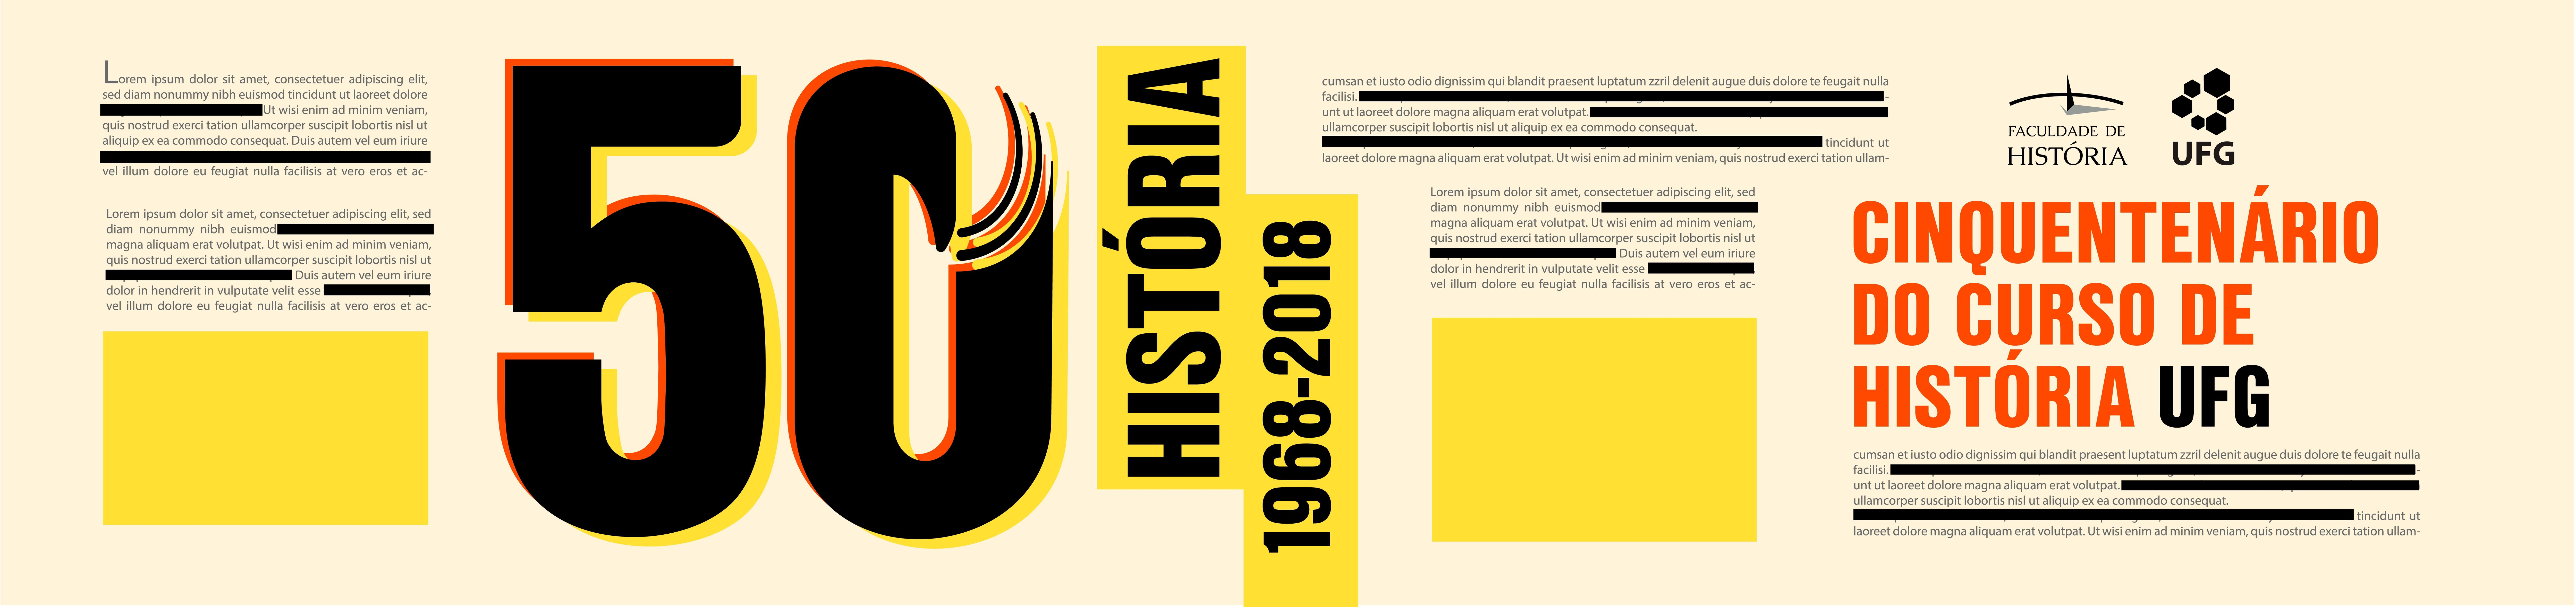 FH Faculdade de Hist³ria